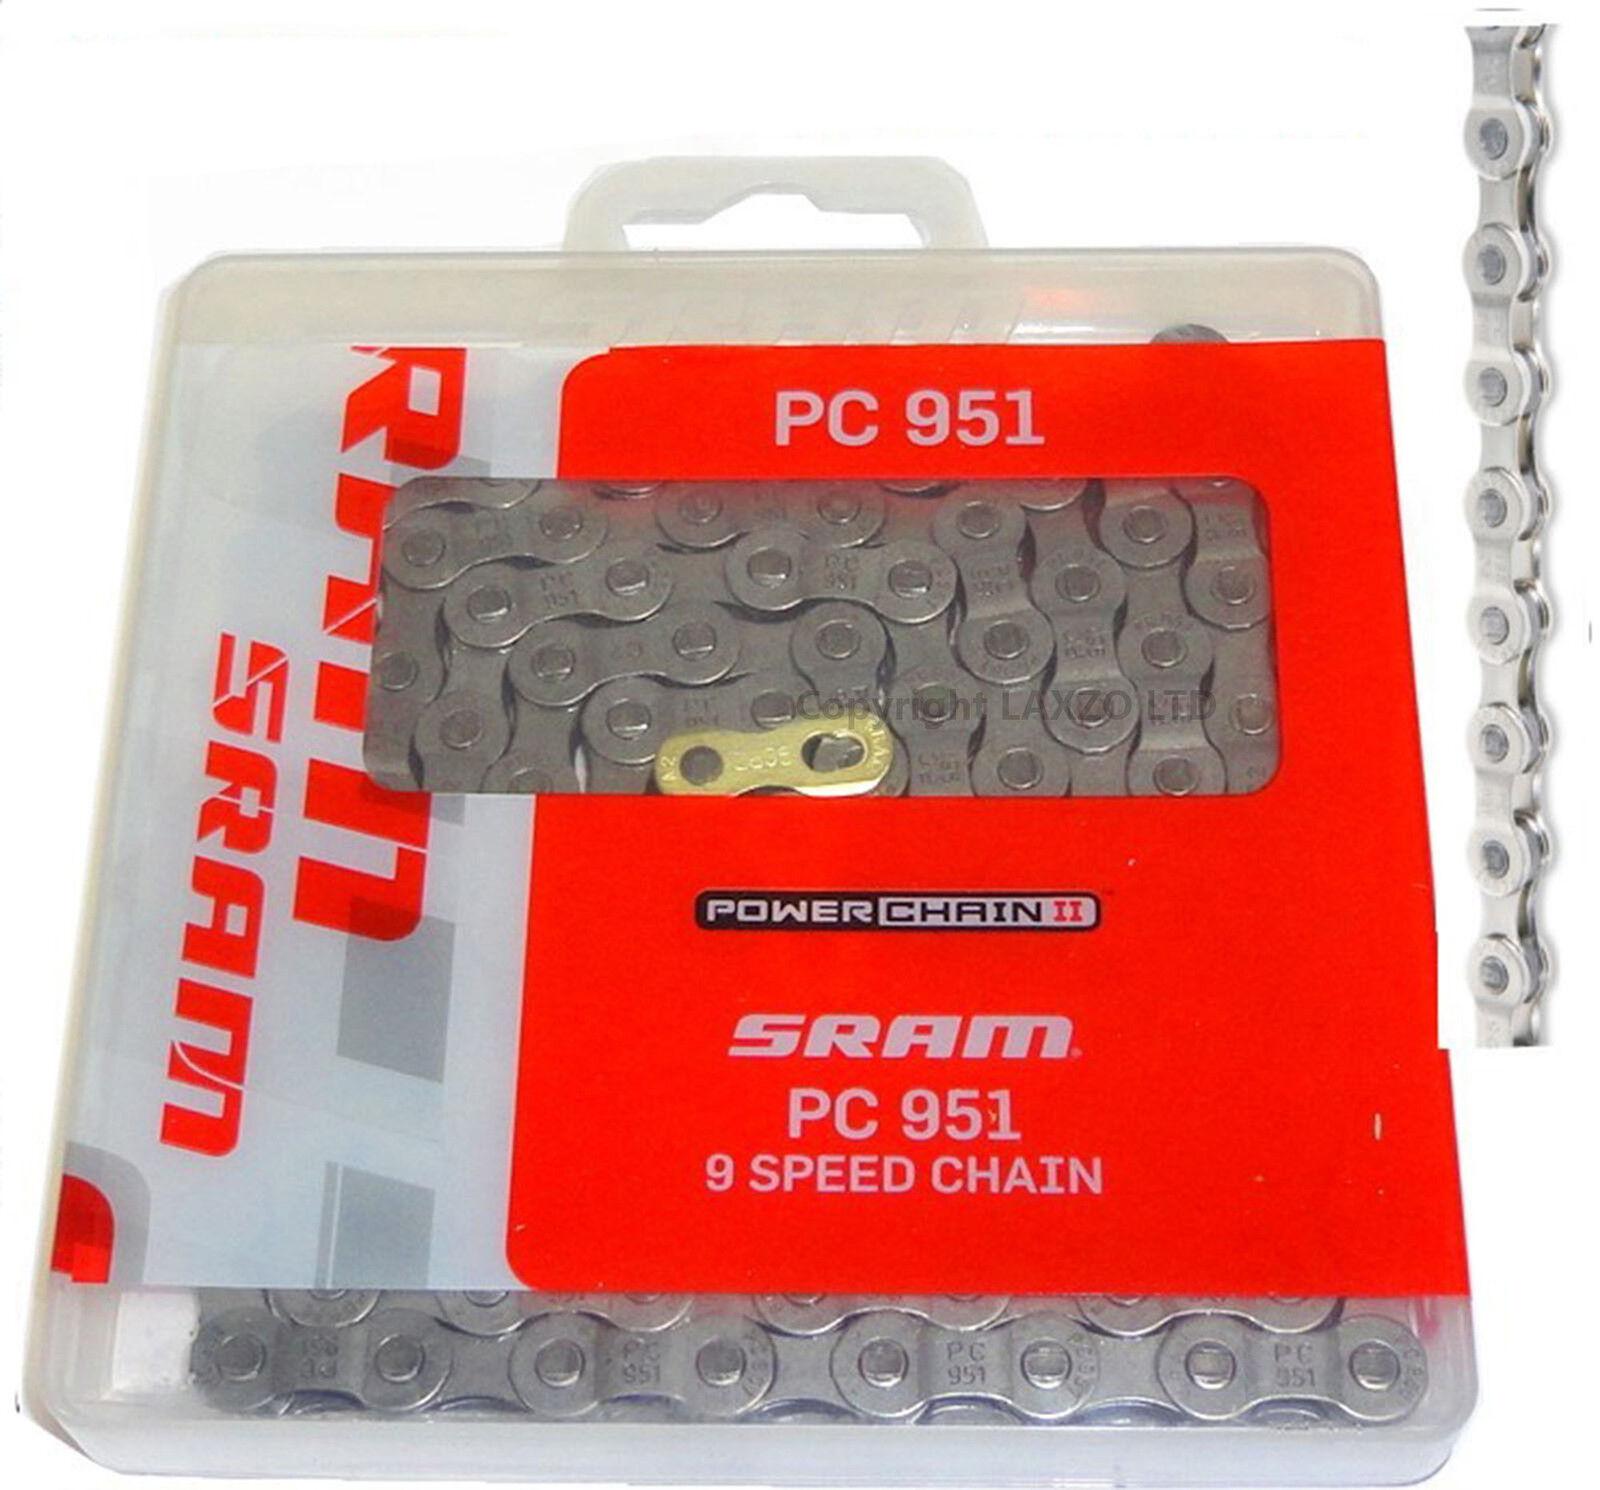 SRAM PC951 PowerChain II 9 Vitesse Vitesse Vitesse MTB Chaîne Vélo Cycle Or Mixte f4afee